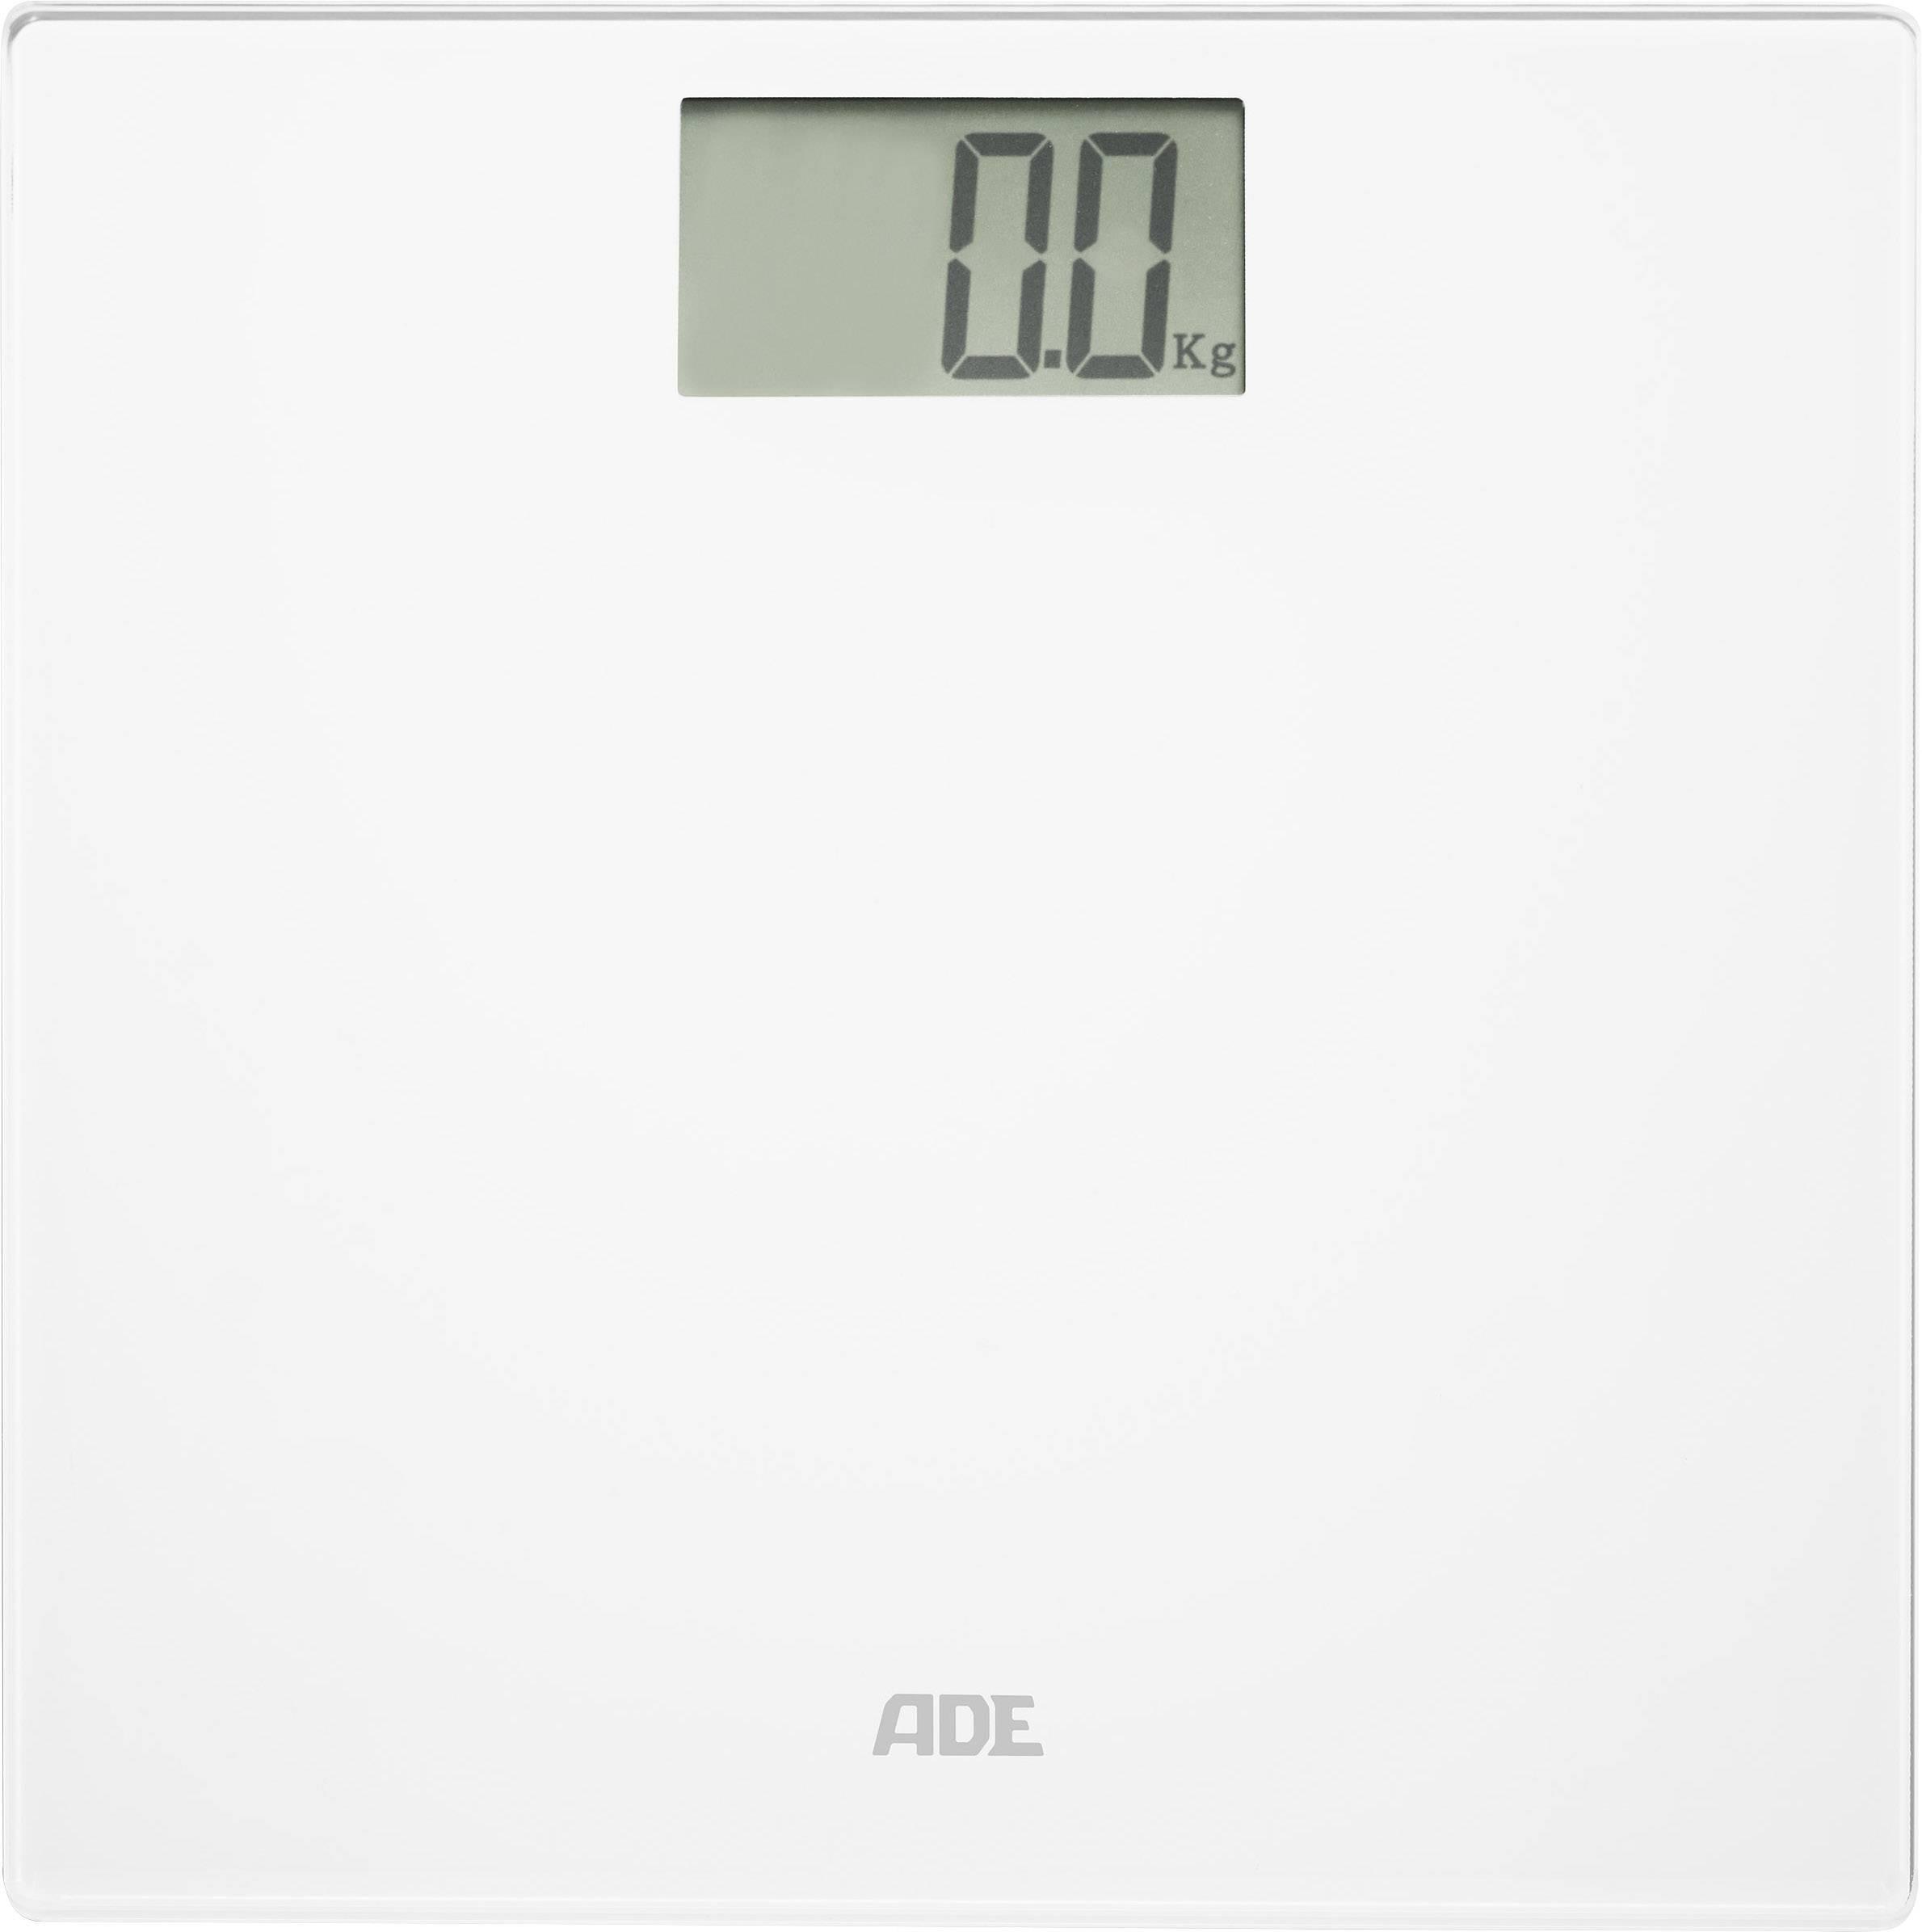 Digitálna osobná váha ADE BE 1707 Ina, čisto biela